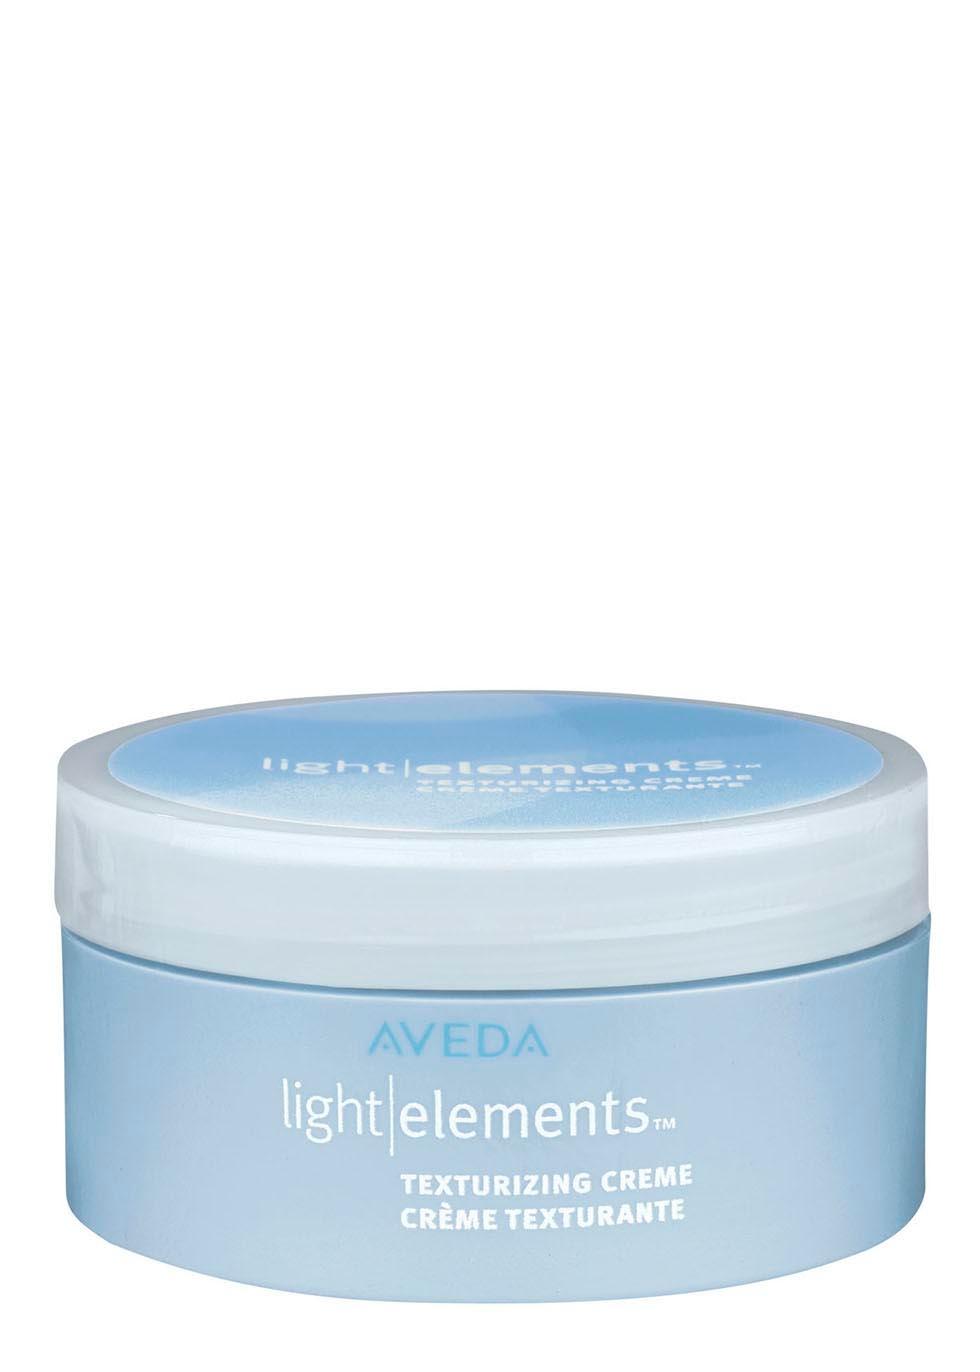 Light Elements™ Texturizing Crème 75ml